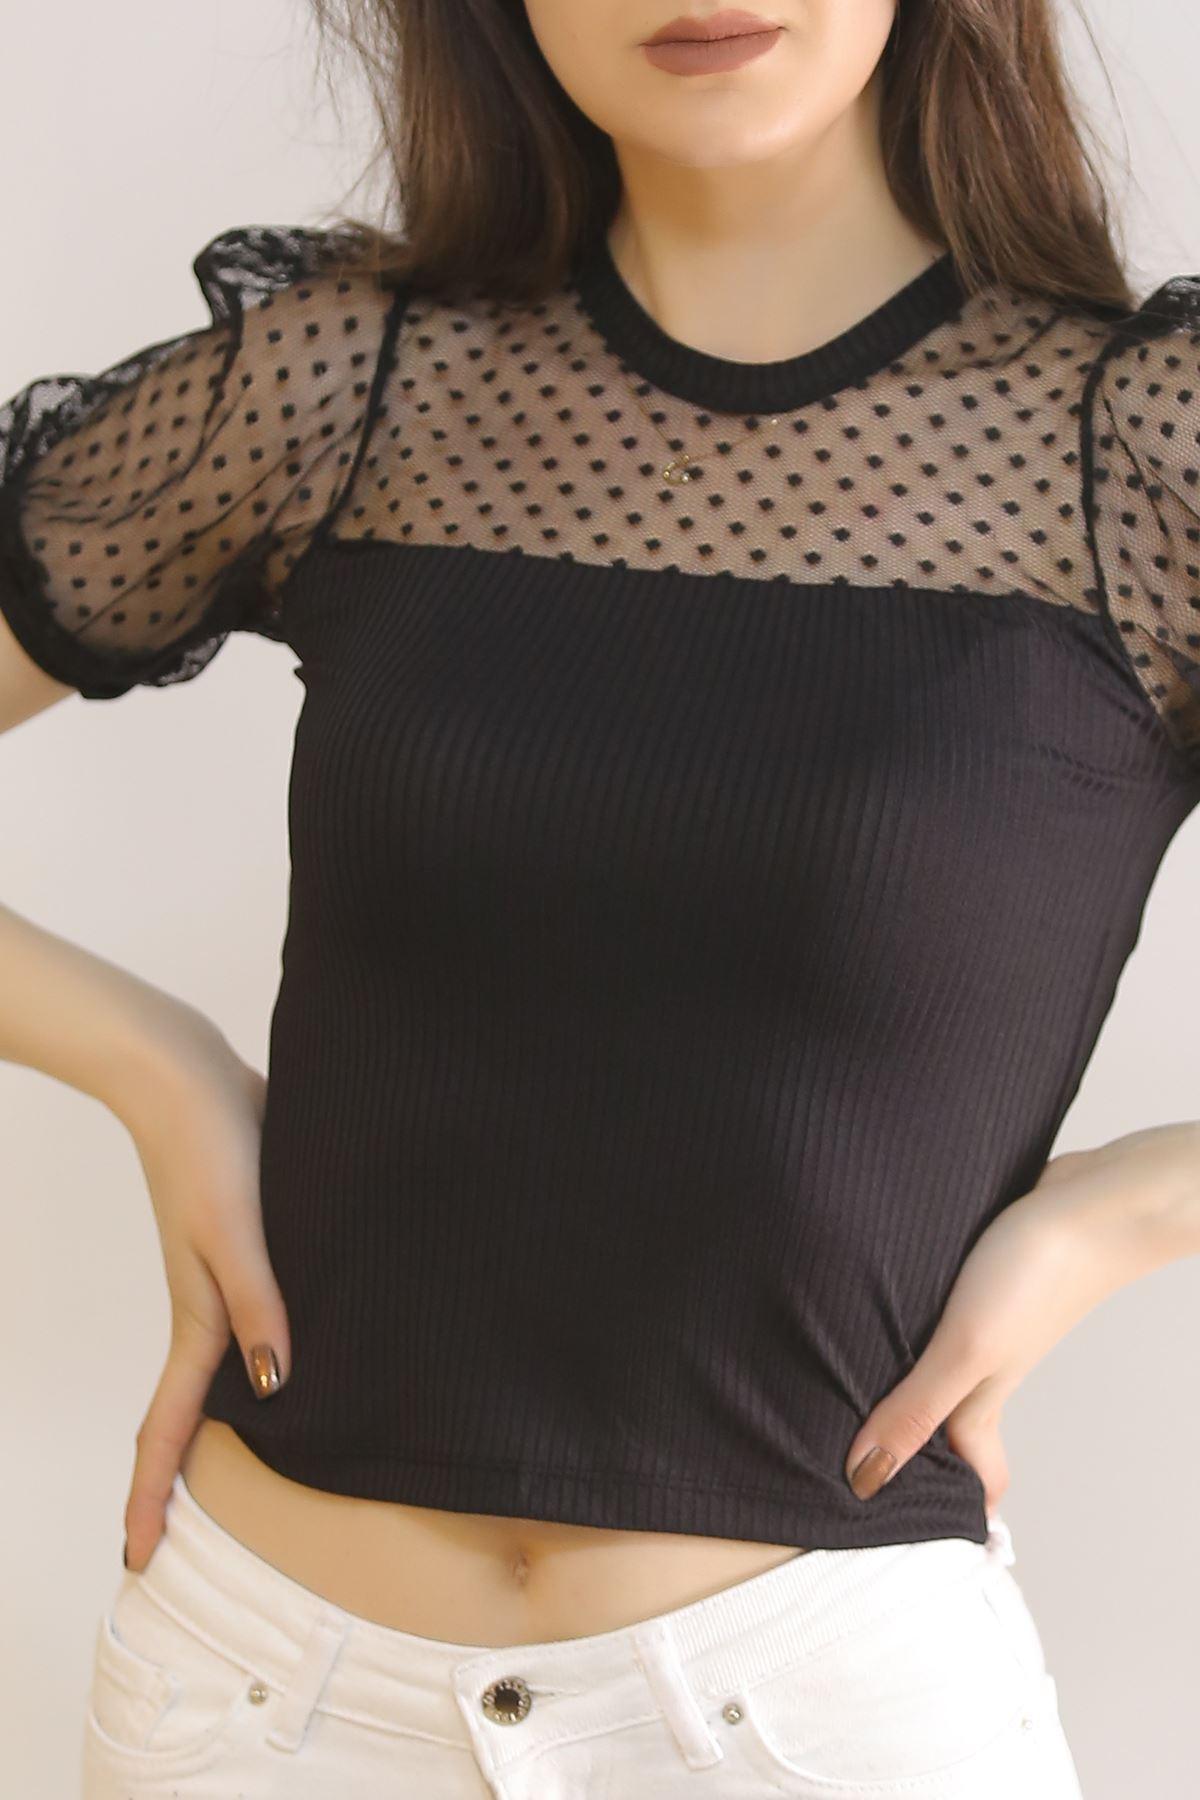 Önü Dantelli Bluz Siyah - 5854.224.